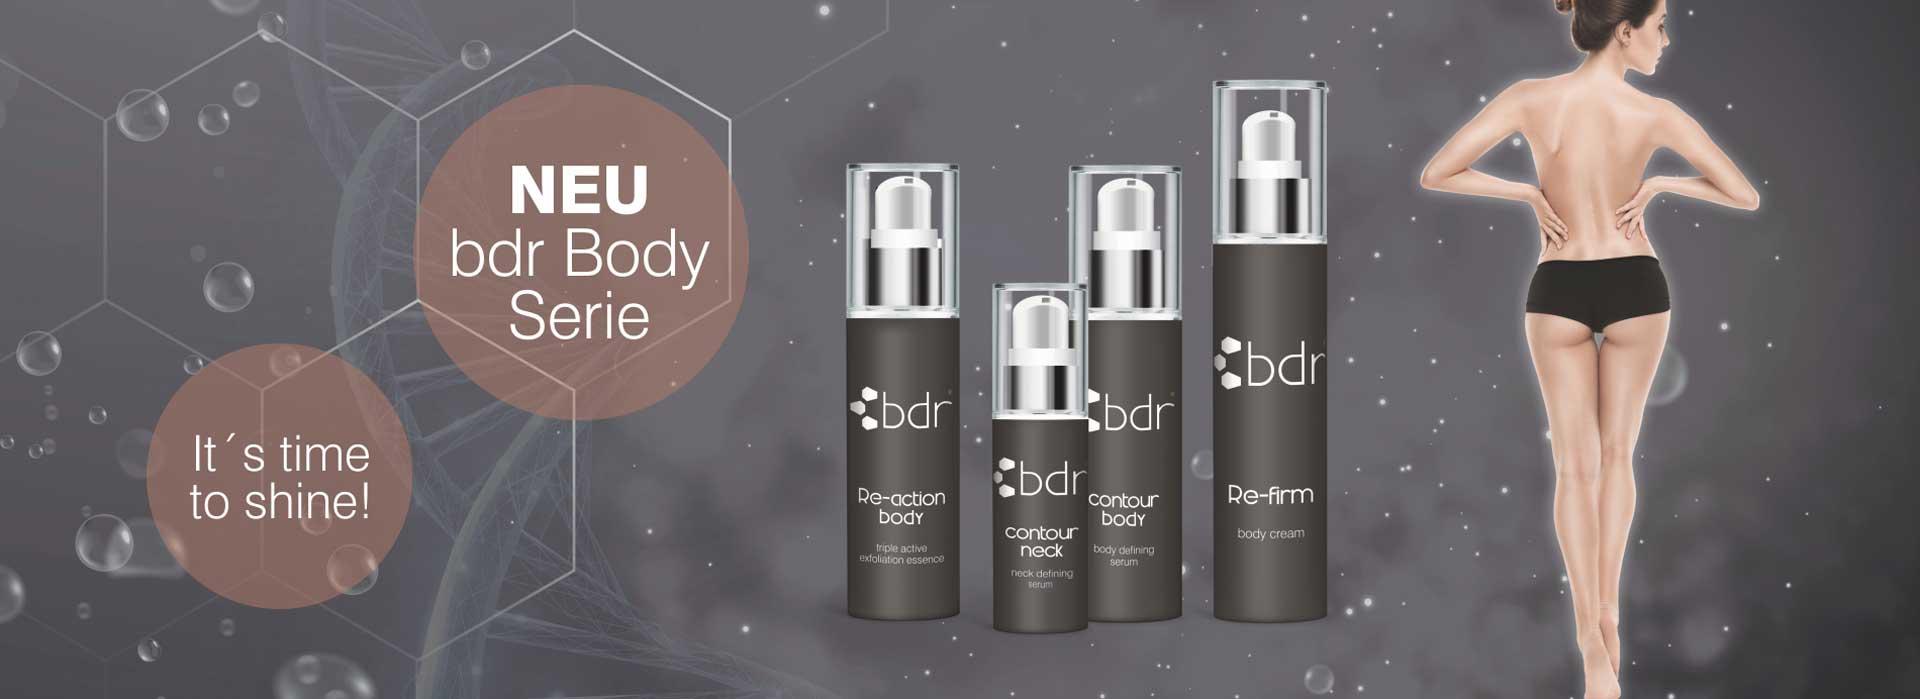 NEU: bdr body Serie